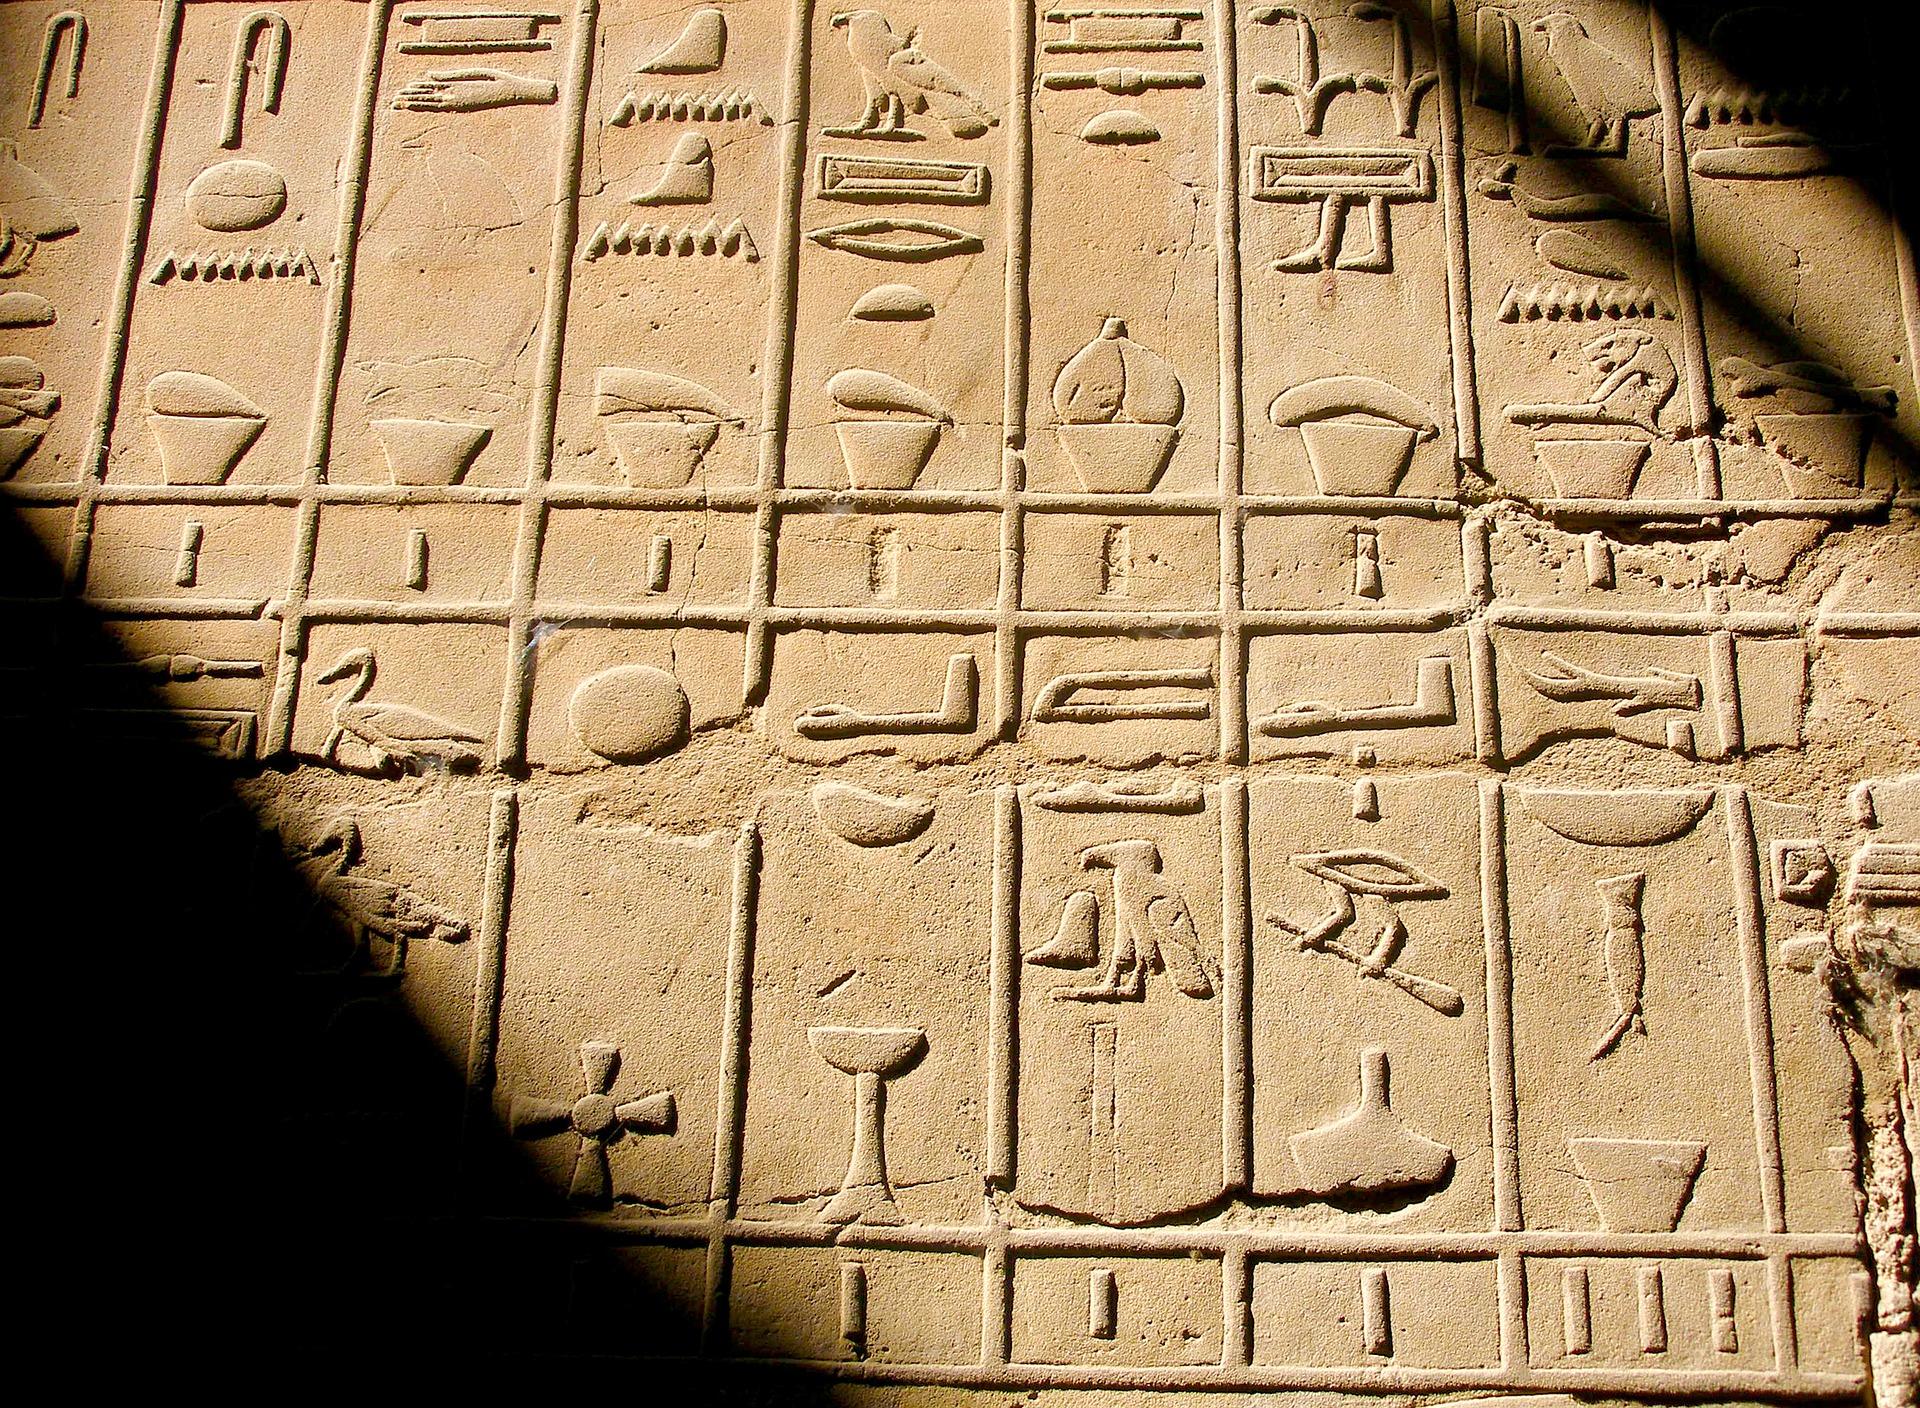 Viaje a Egipto - The Indiana Travel Experiences73